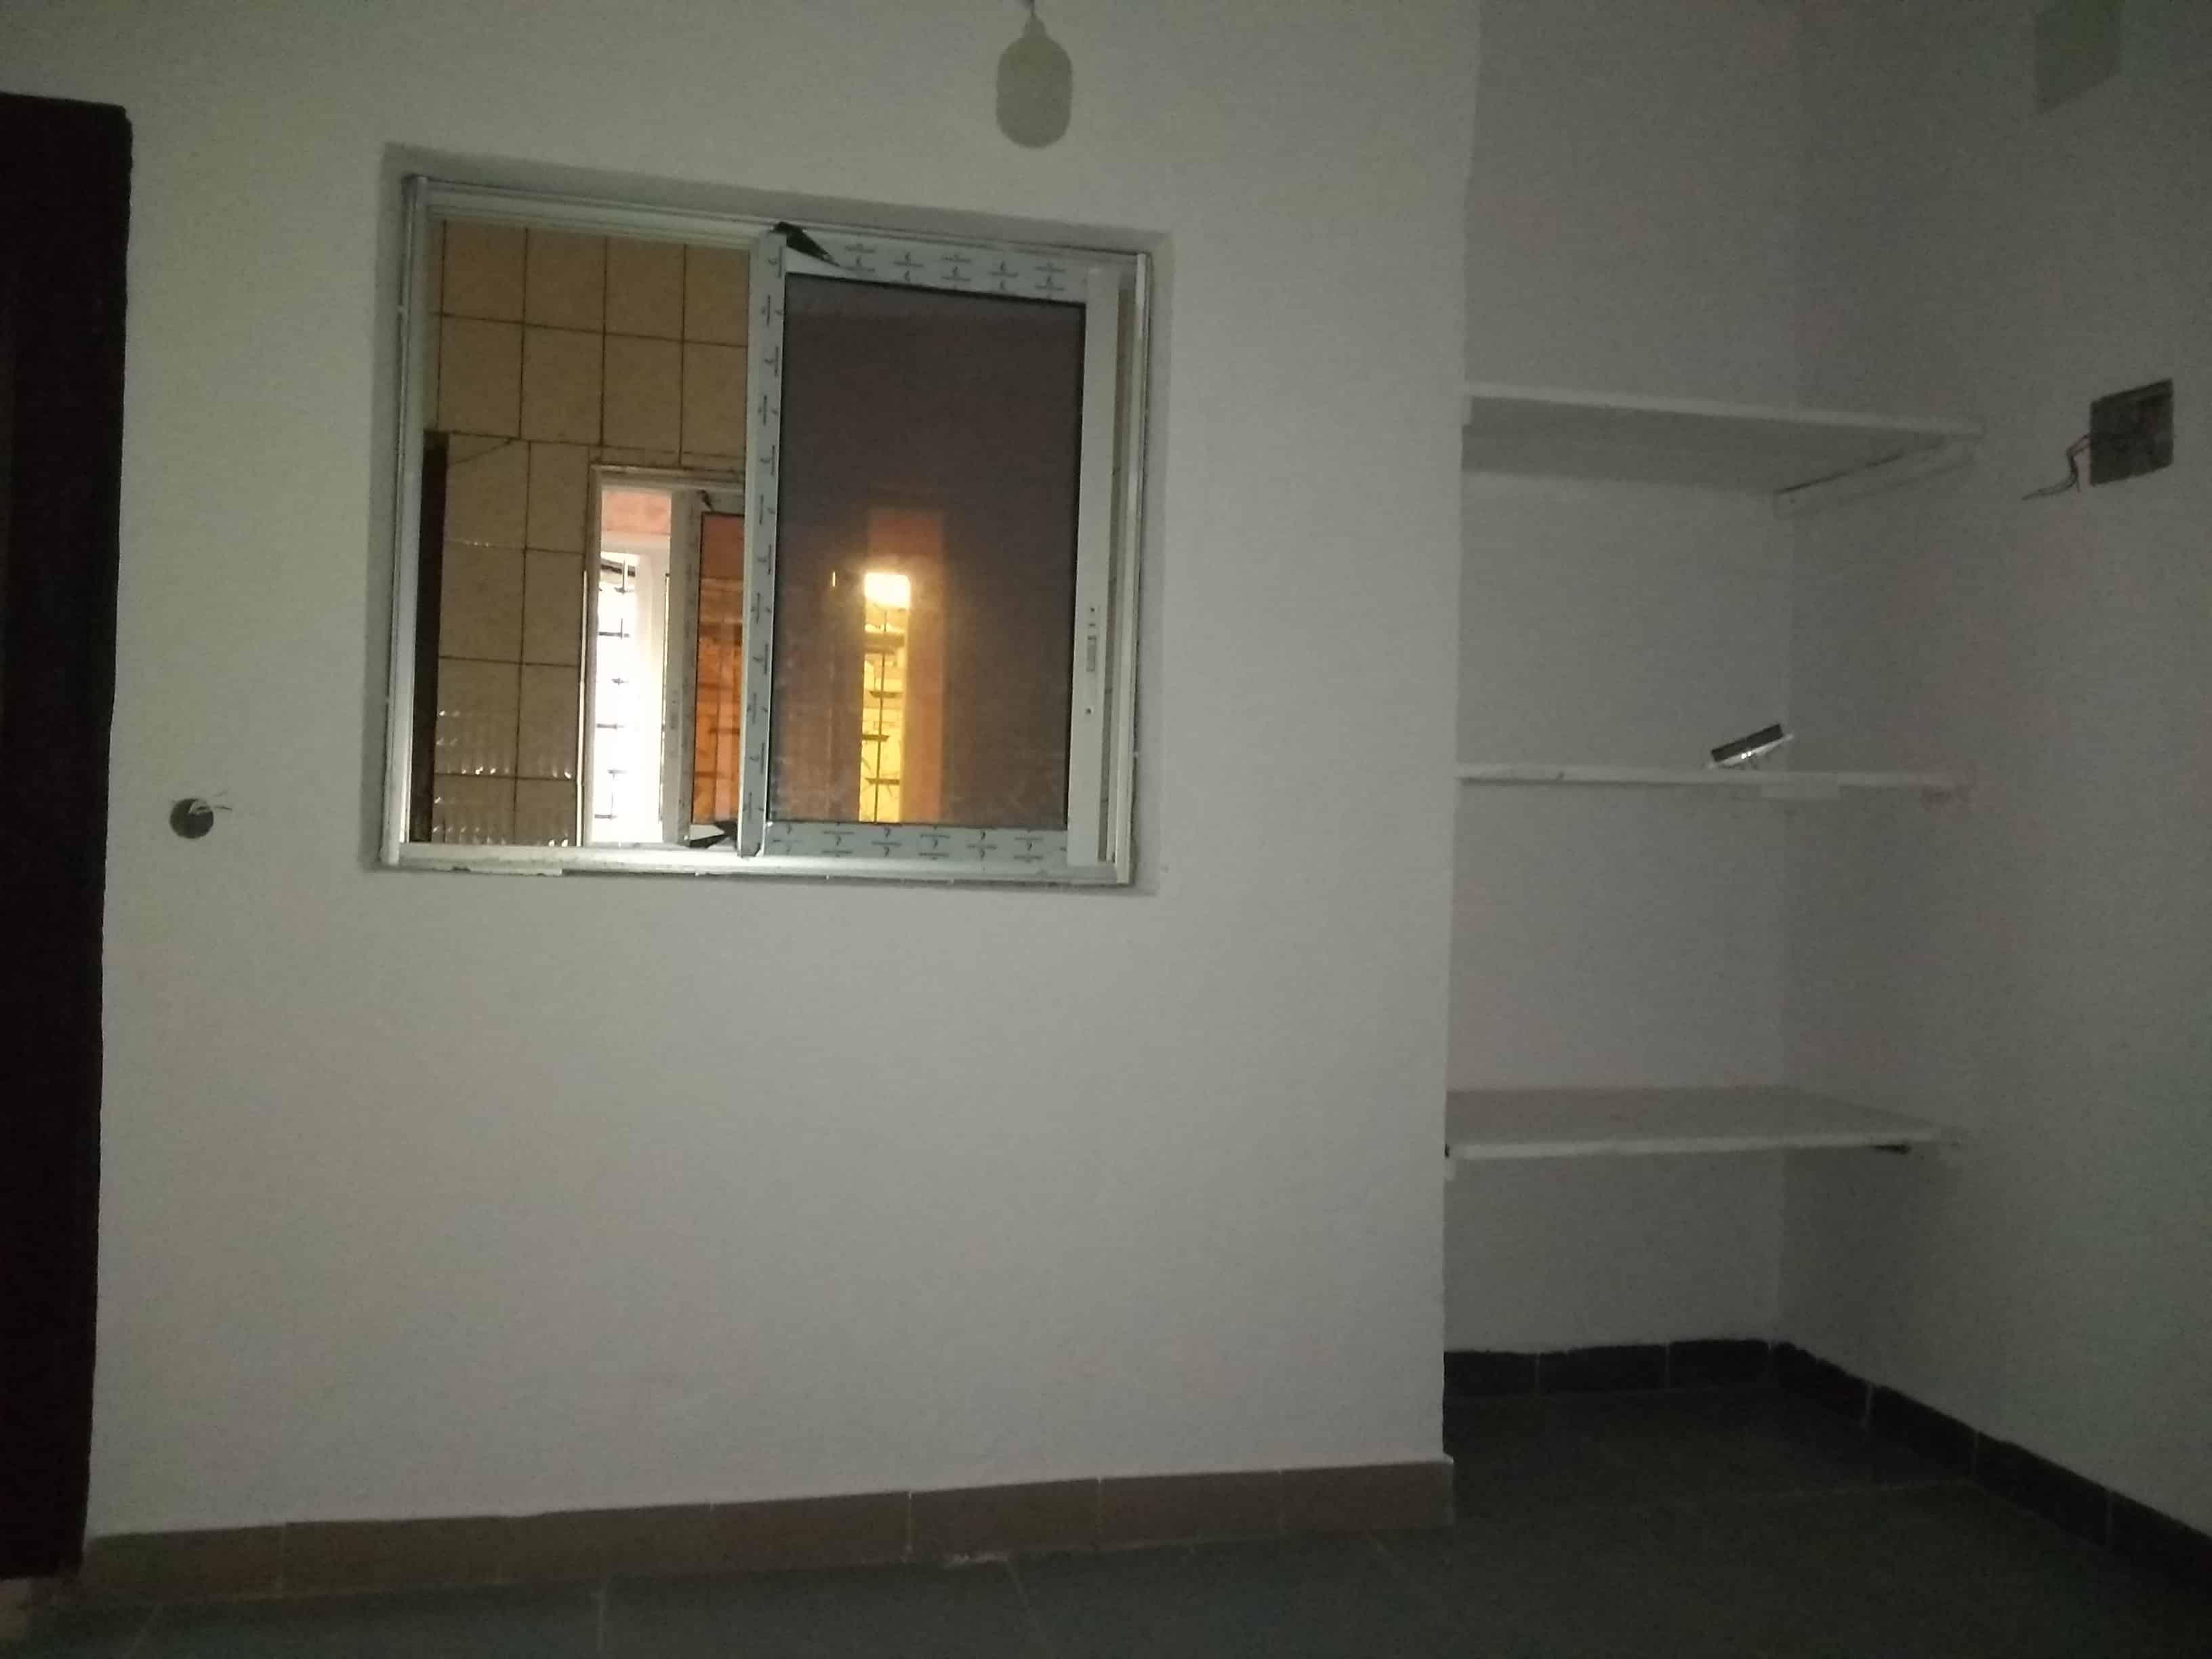 "Apartment to rent - Douala, Logpom, Carrefour"" Gabon bar"" - 1 living room(s), 1 bedroom(s), 1 bathroom(s) - 90 000 FCFA / month"